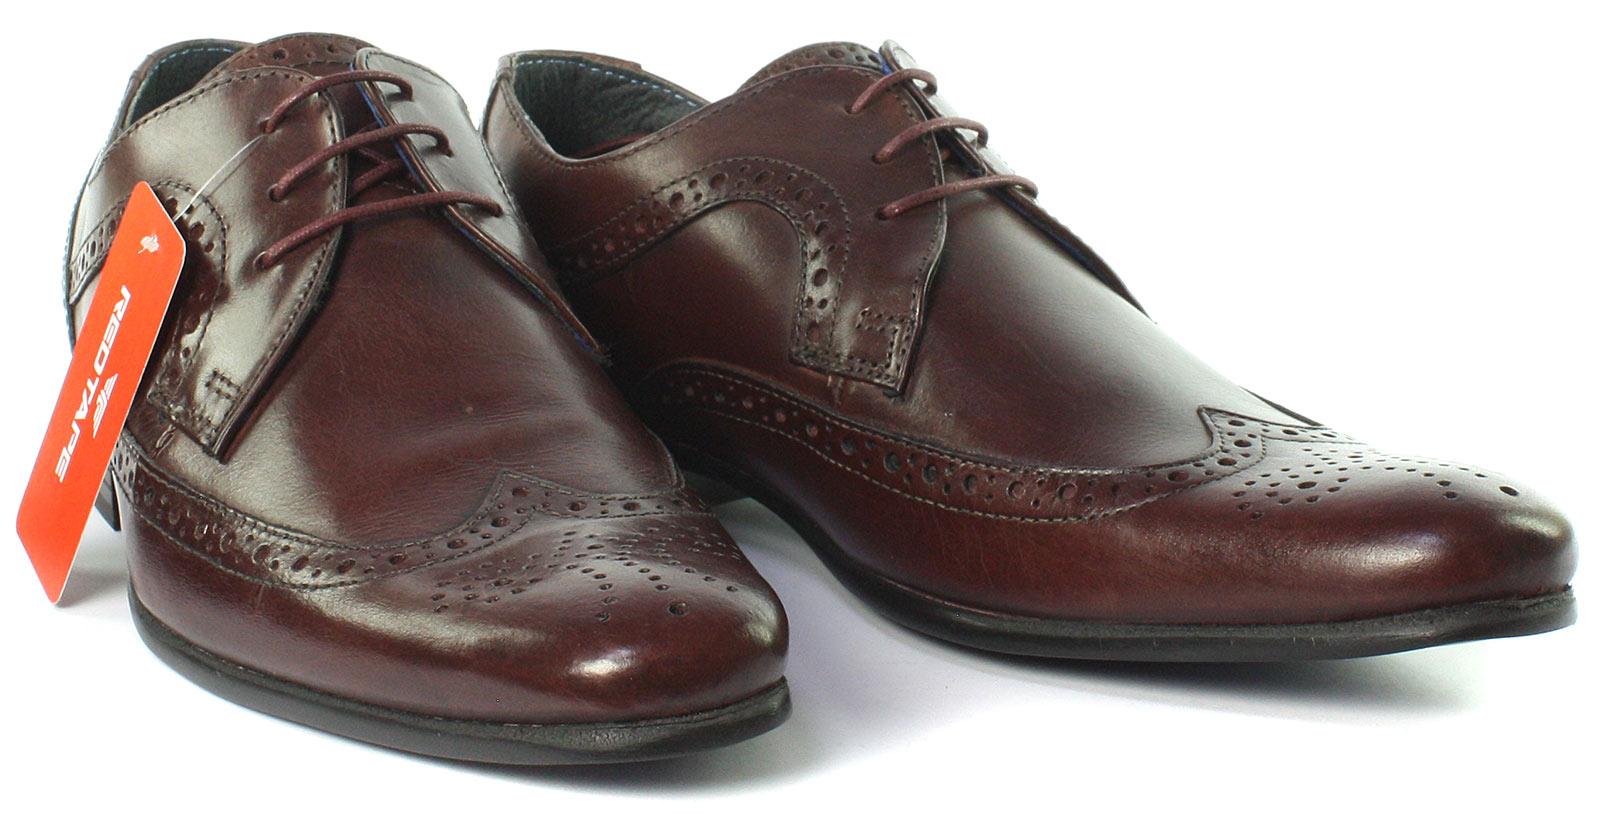 Business Schuhe Herrenschuhe New Red Tape Nappa Brown Mens